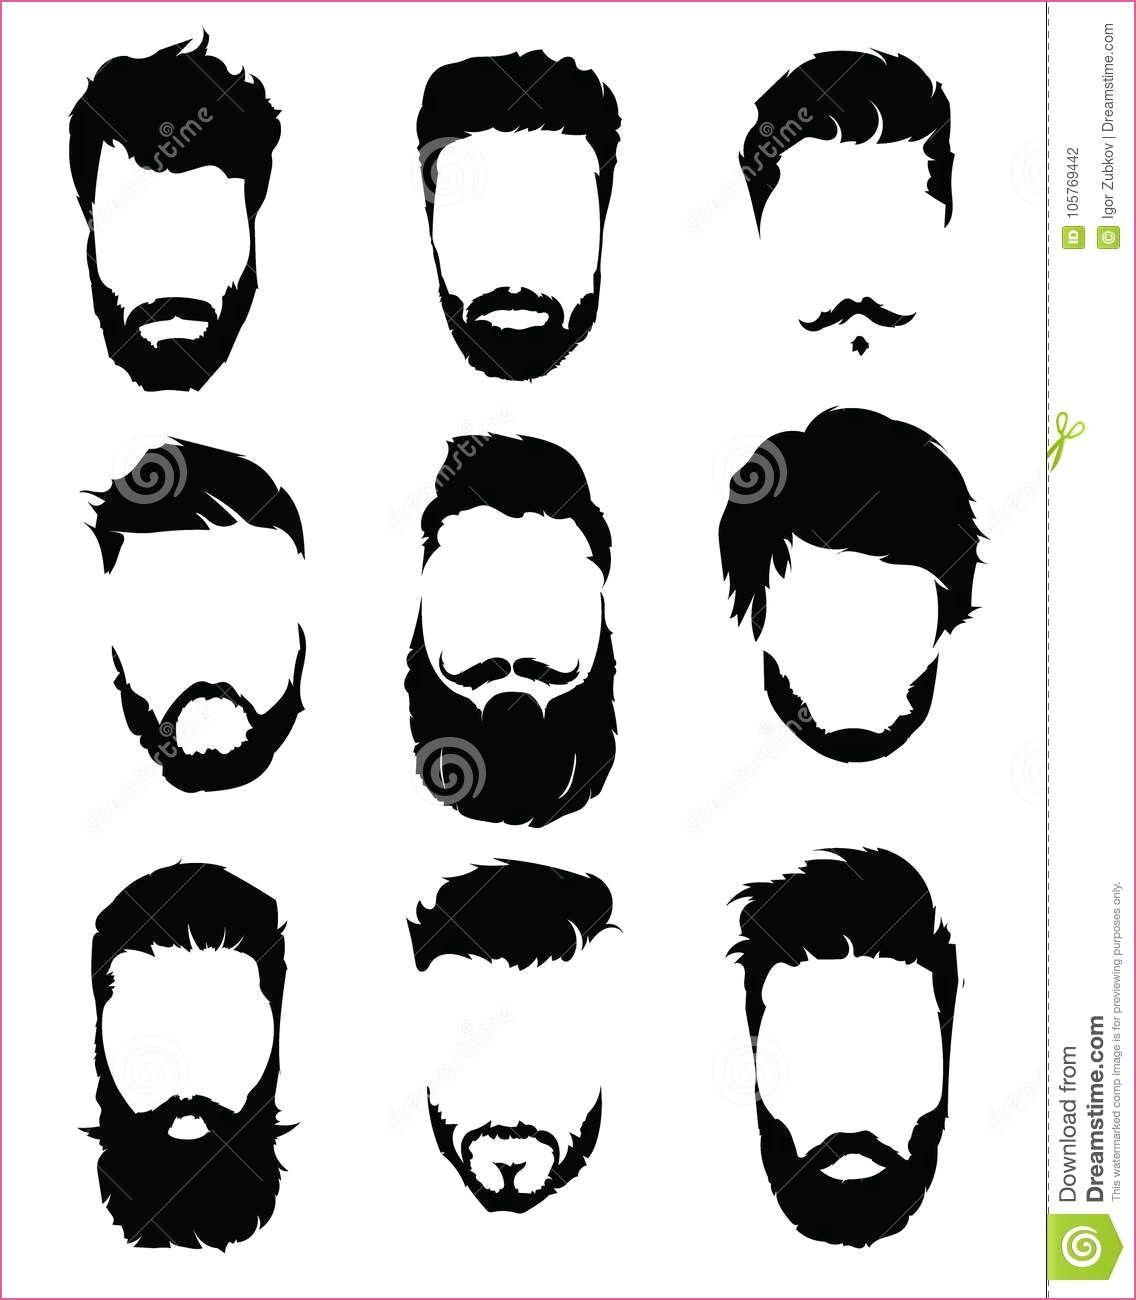 Frisuren 10 Männer . Frisuren 10 Männer . Frisur Sidecut